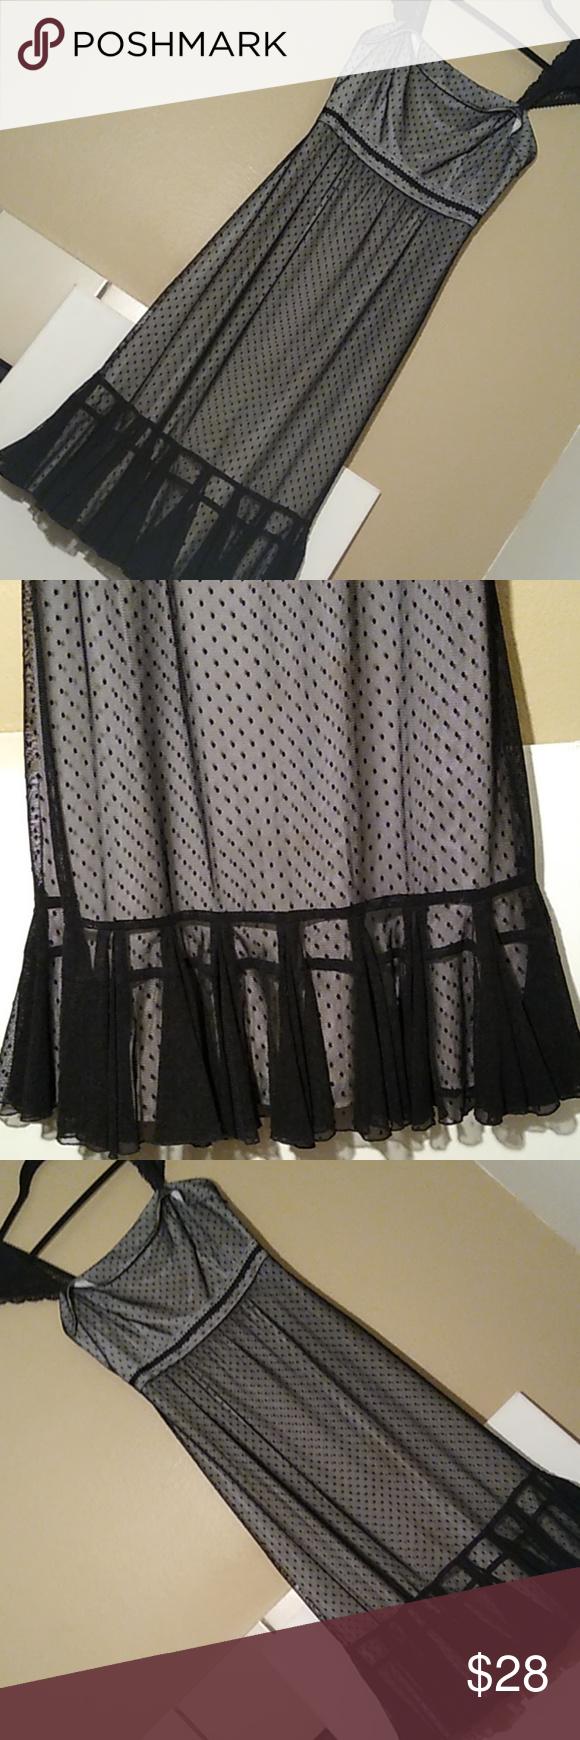 Dust Ruffle Loft Dress Ann Taylor Loft Dress In Excellent Condition Very Cute Black Chiffon Overlay With A Ruf Loft Dress Ann Taylor Loft Dresses Dust Ruffle